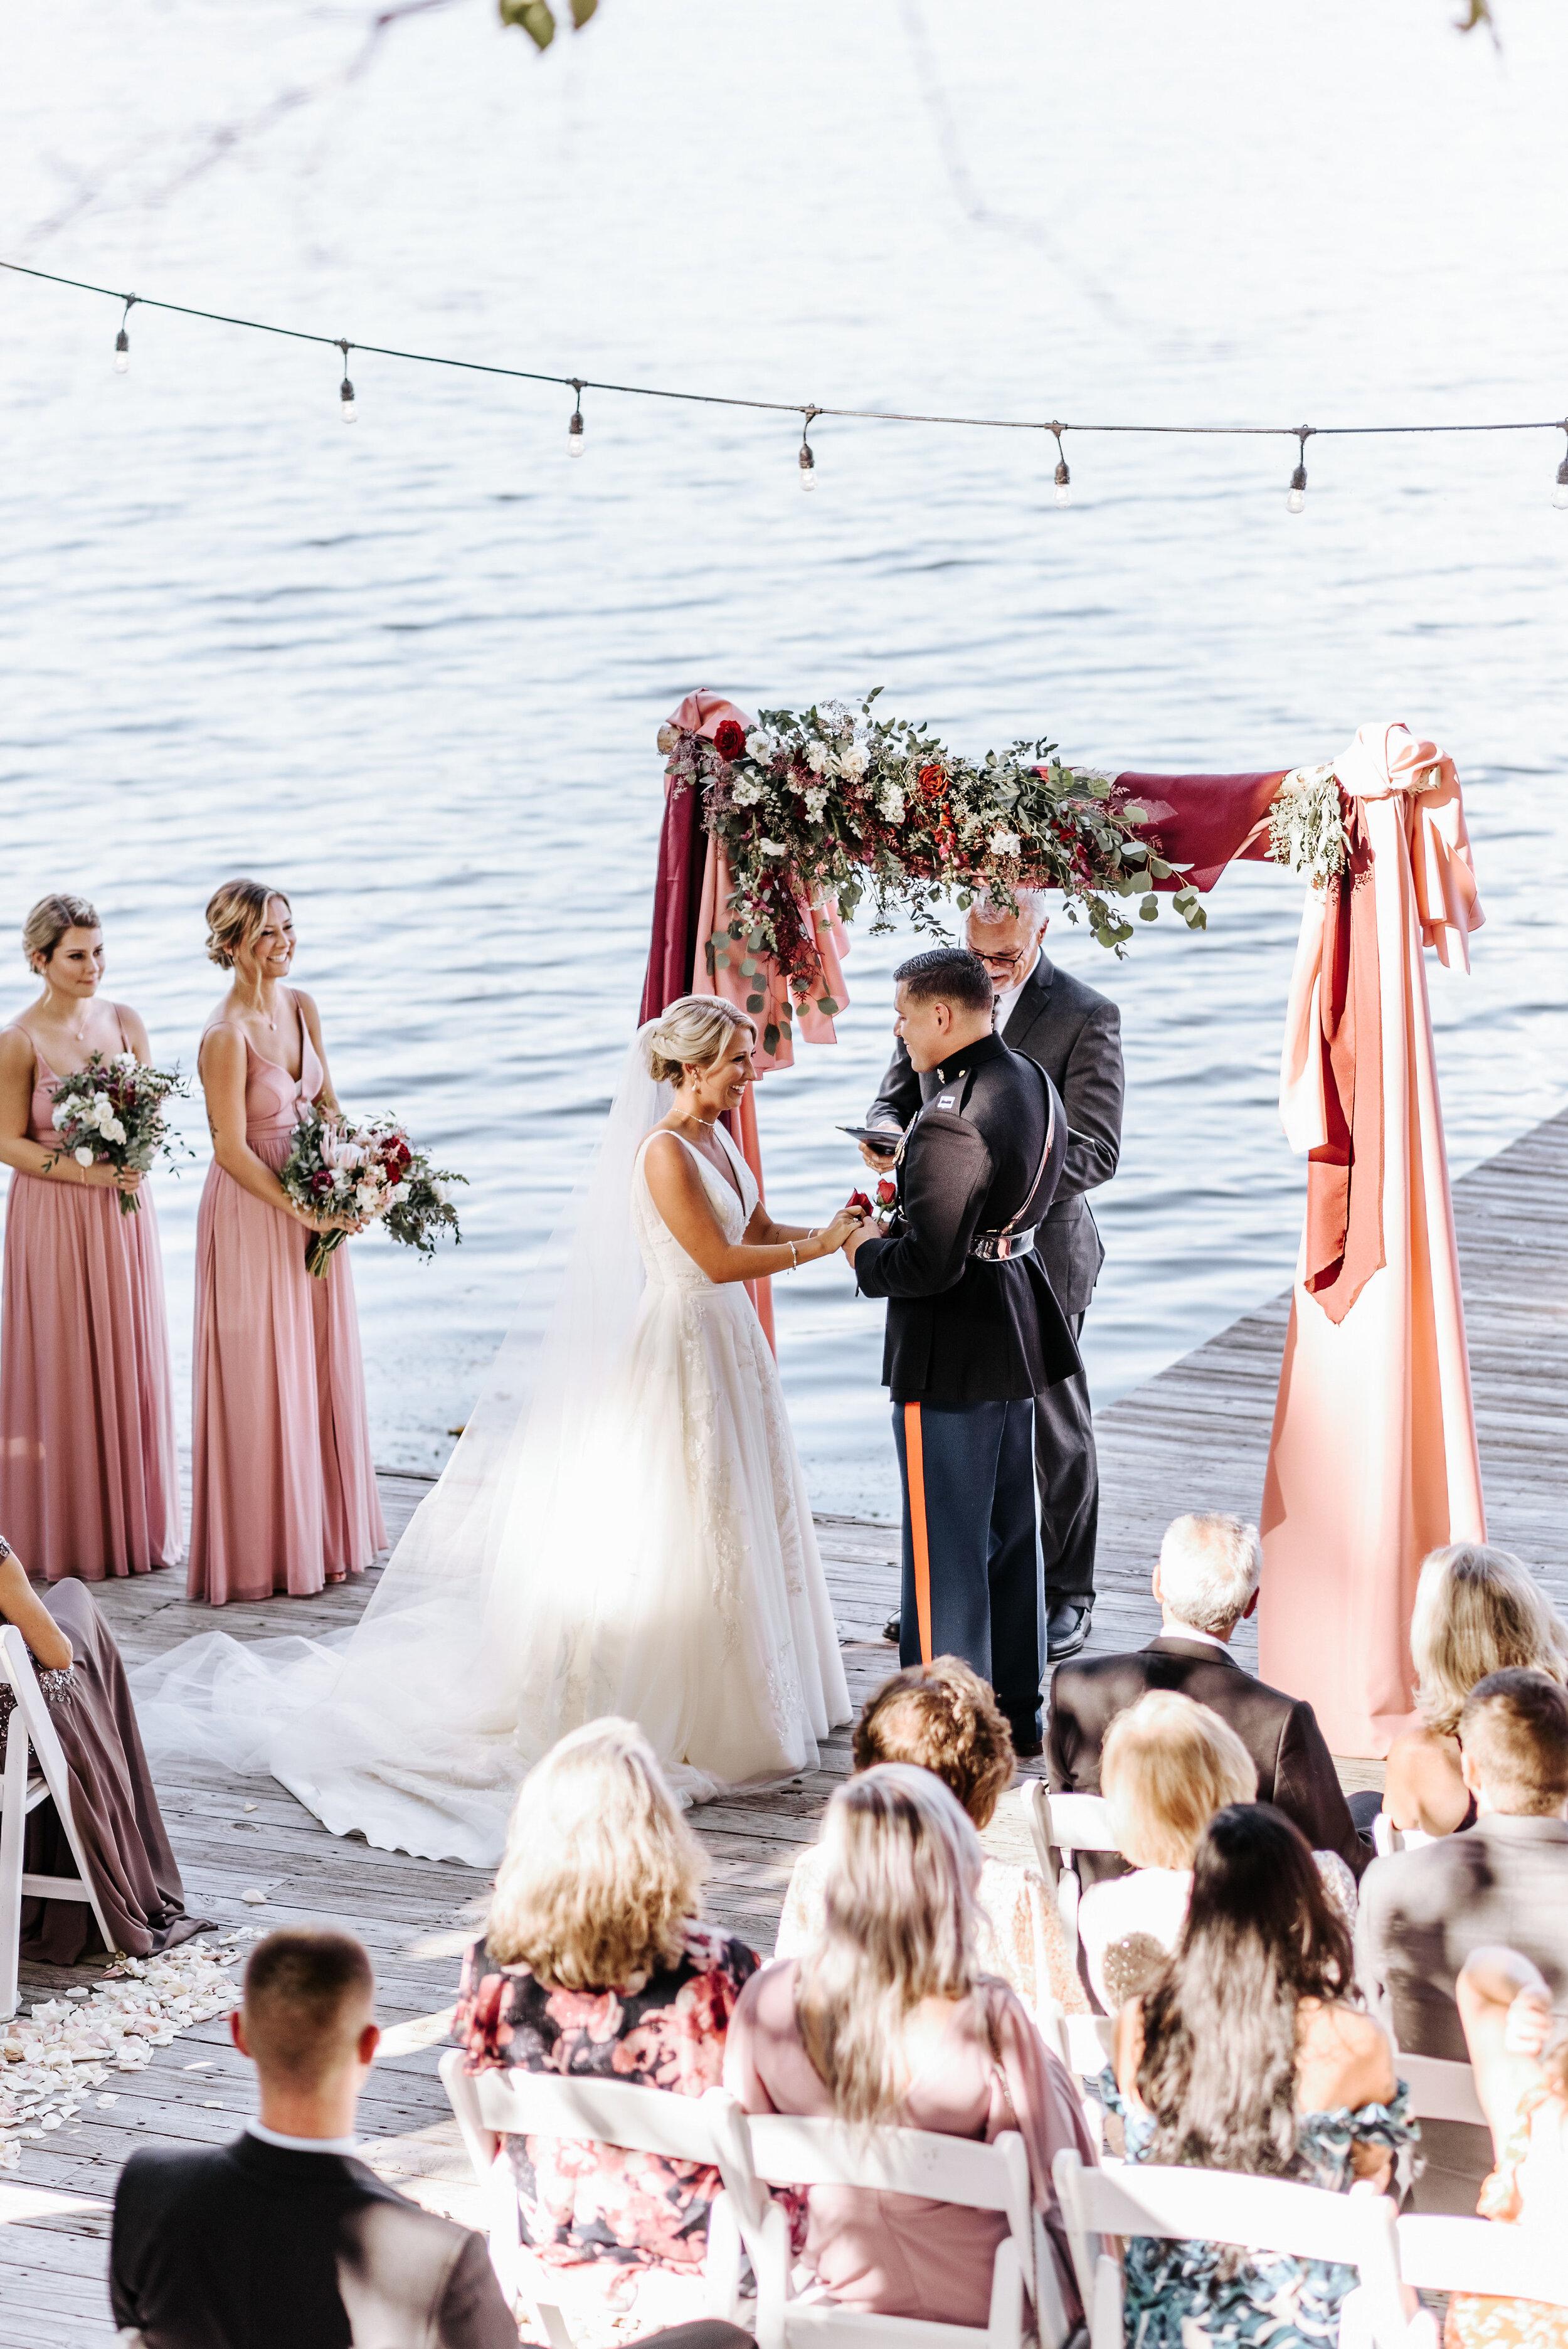 Emily_Mike_Wedding_Celebrations_at_the_Reservoir_Pool_Pavilion_Richmond_Virginia_Wedding_Photographer_Photography_by_V_51.jpg